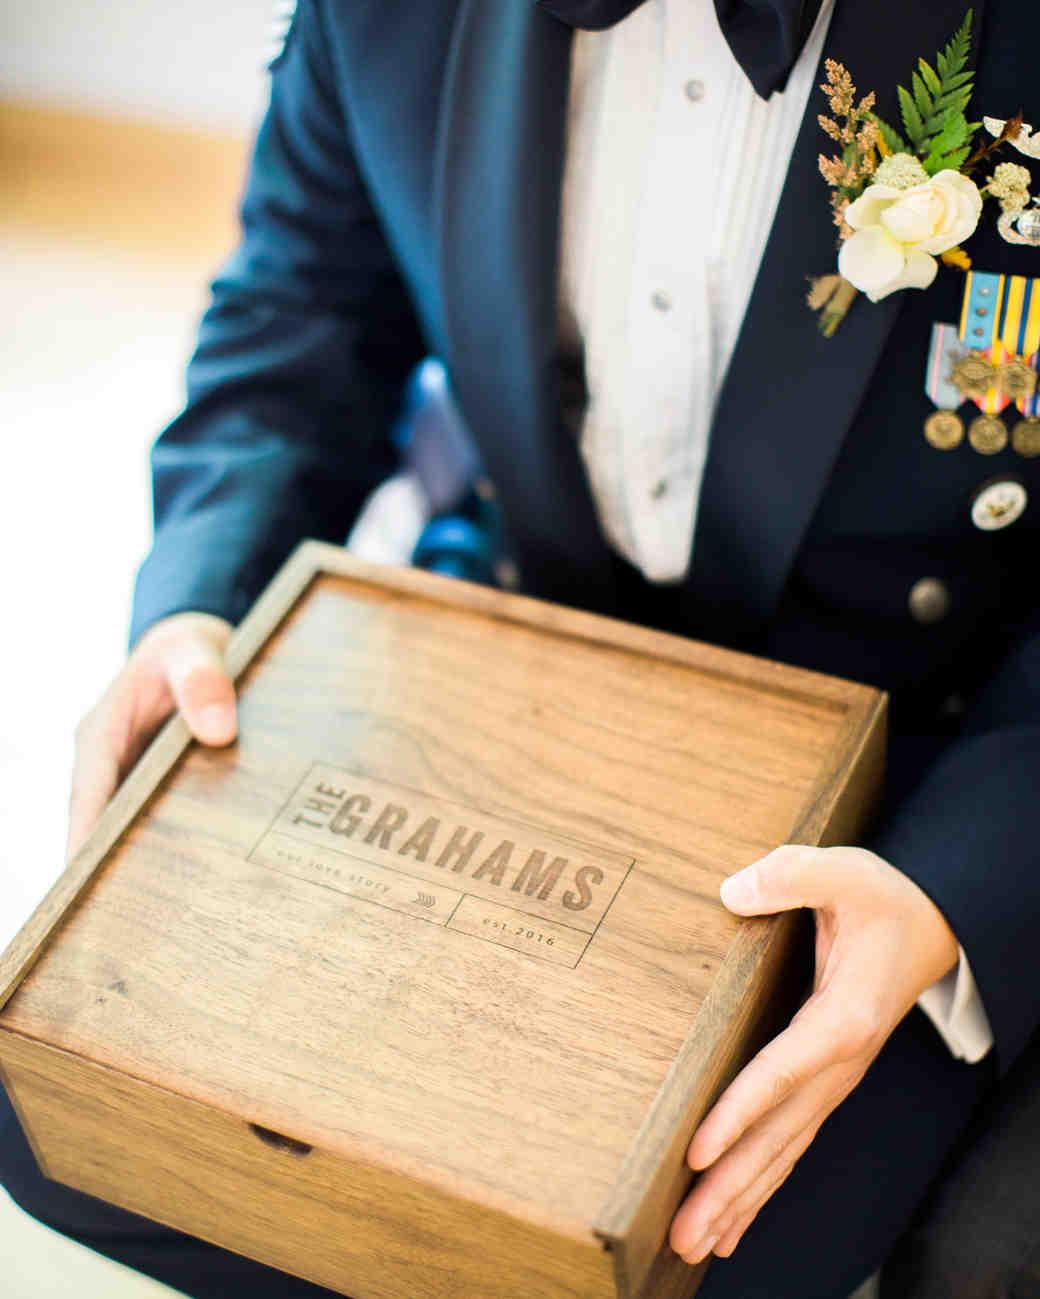 megan scott wedding personalized box